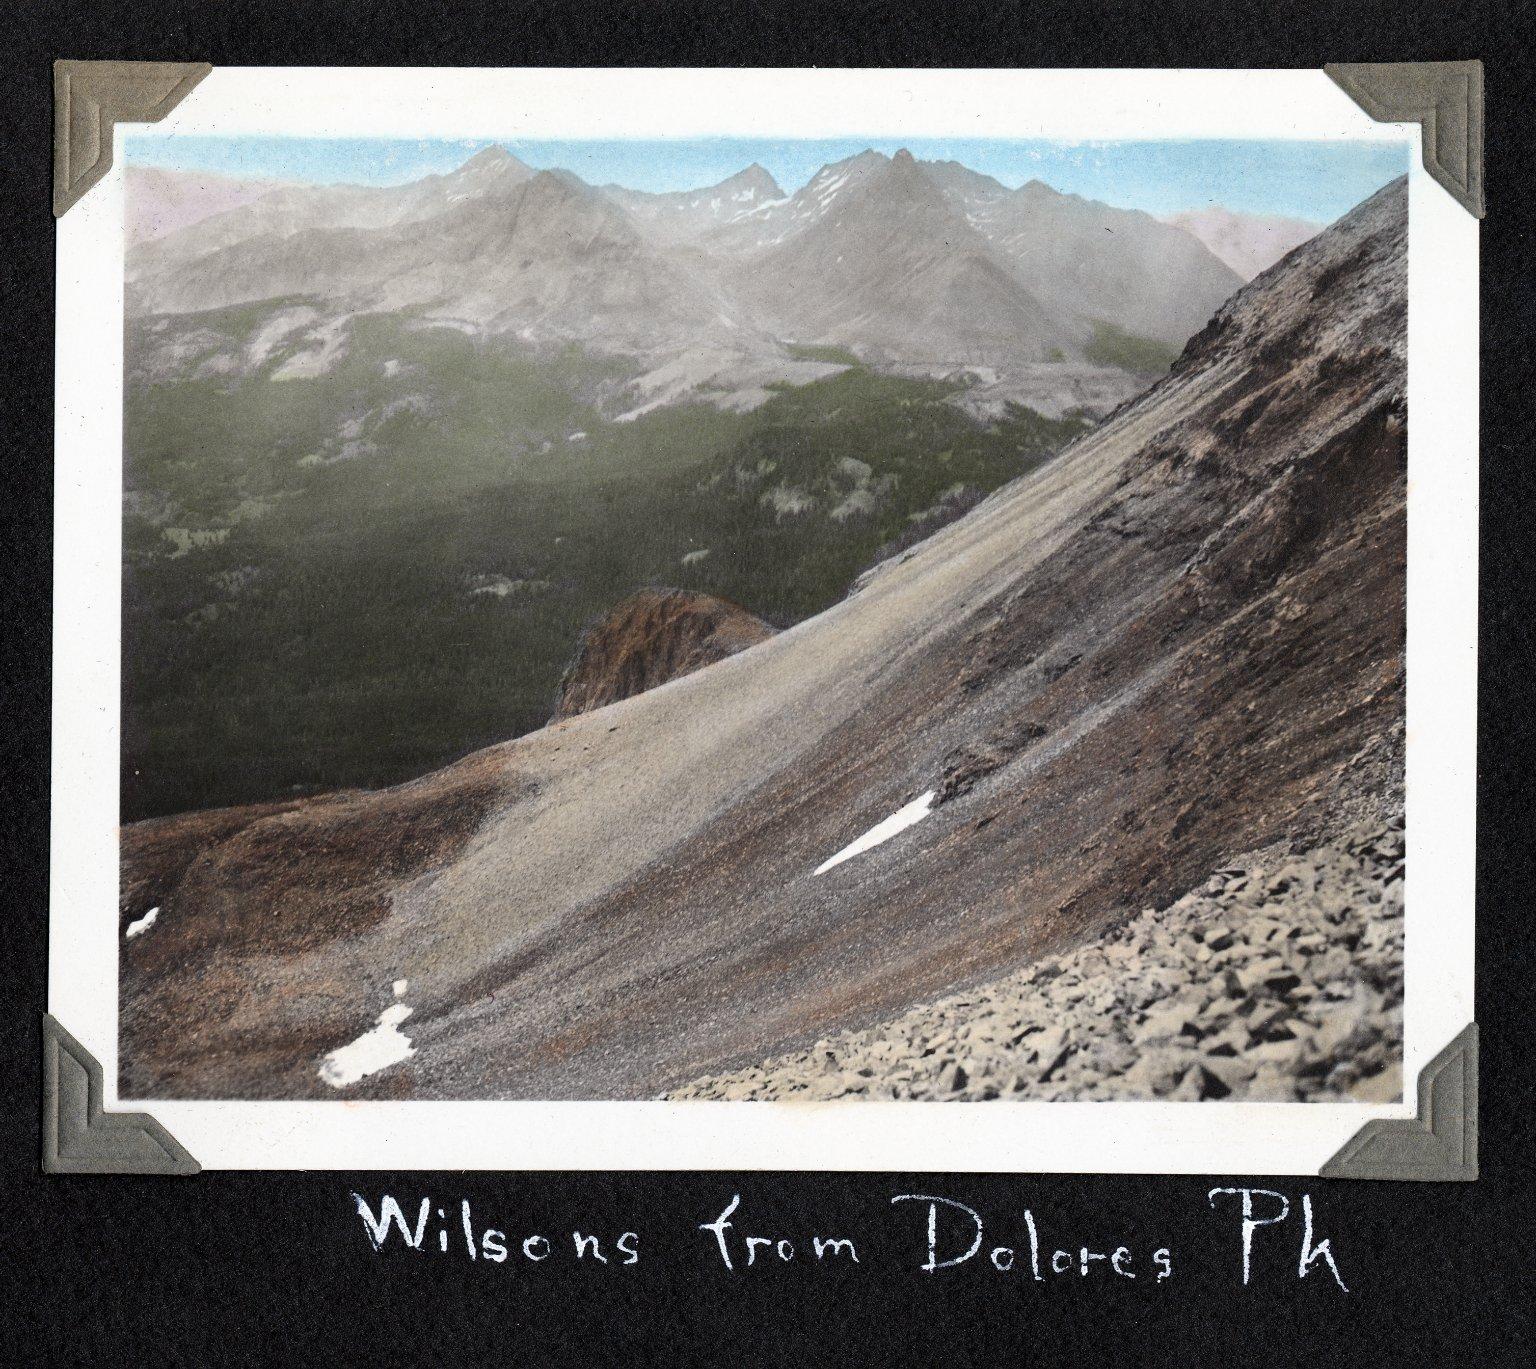 Wilsons from Dolores Peak, 1